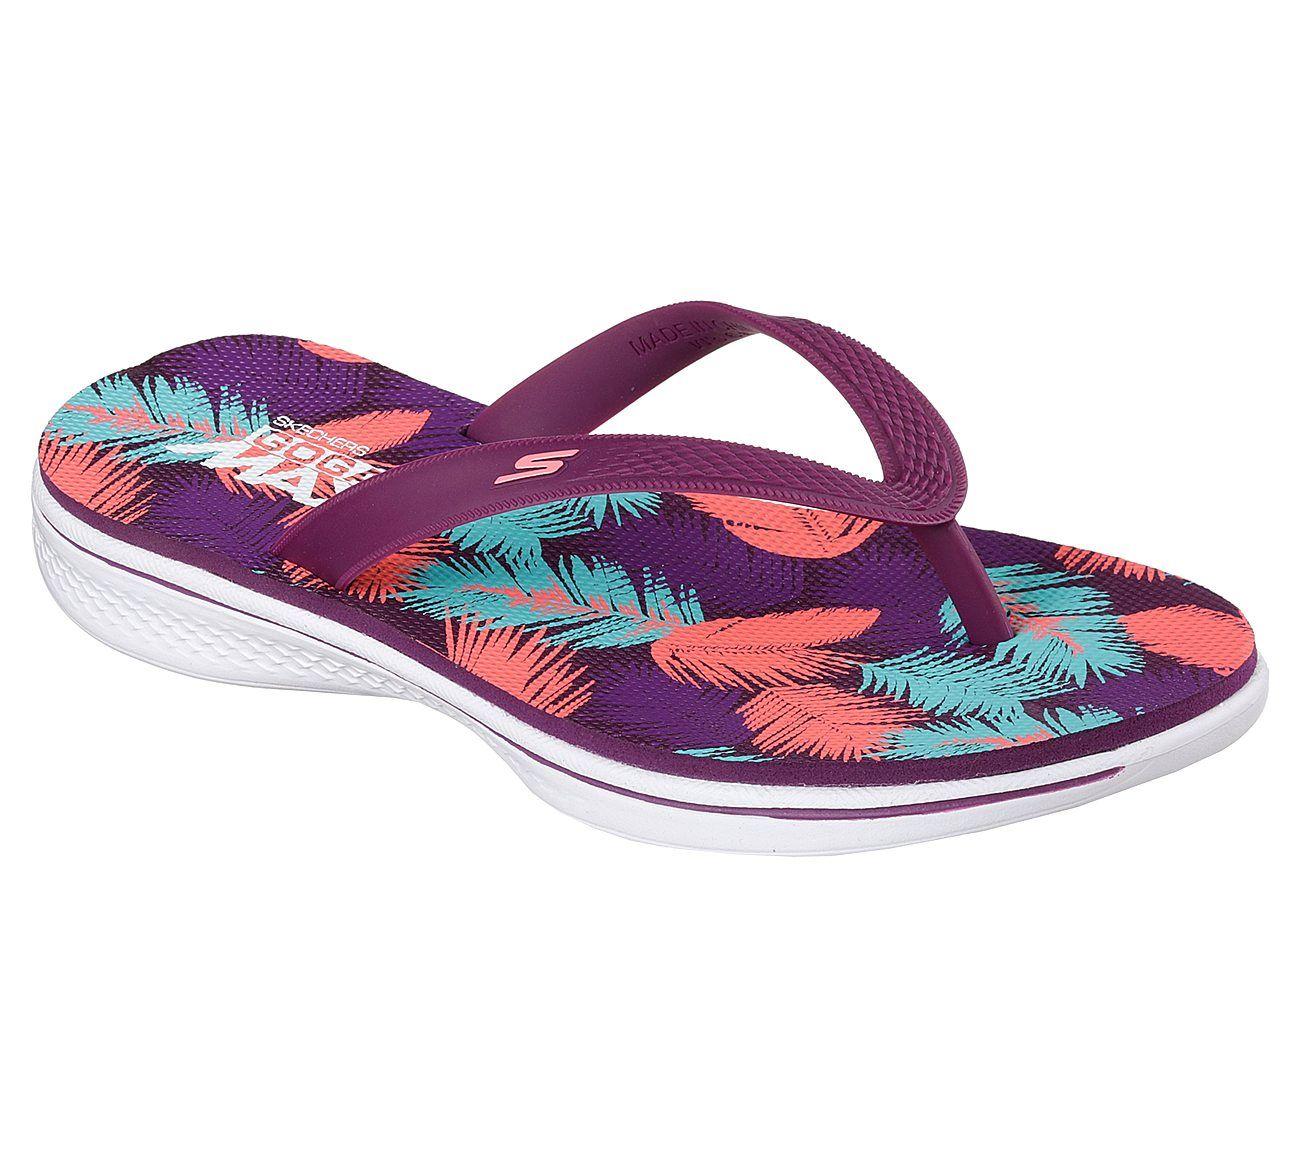 Lagoon sandal. Sculpted soft rubber